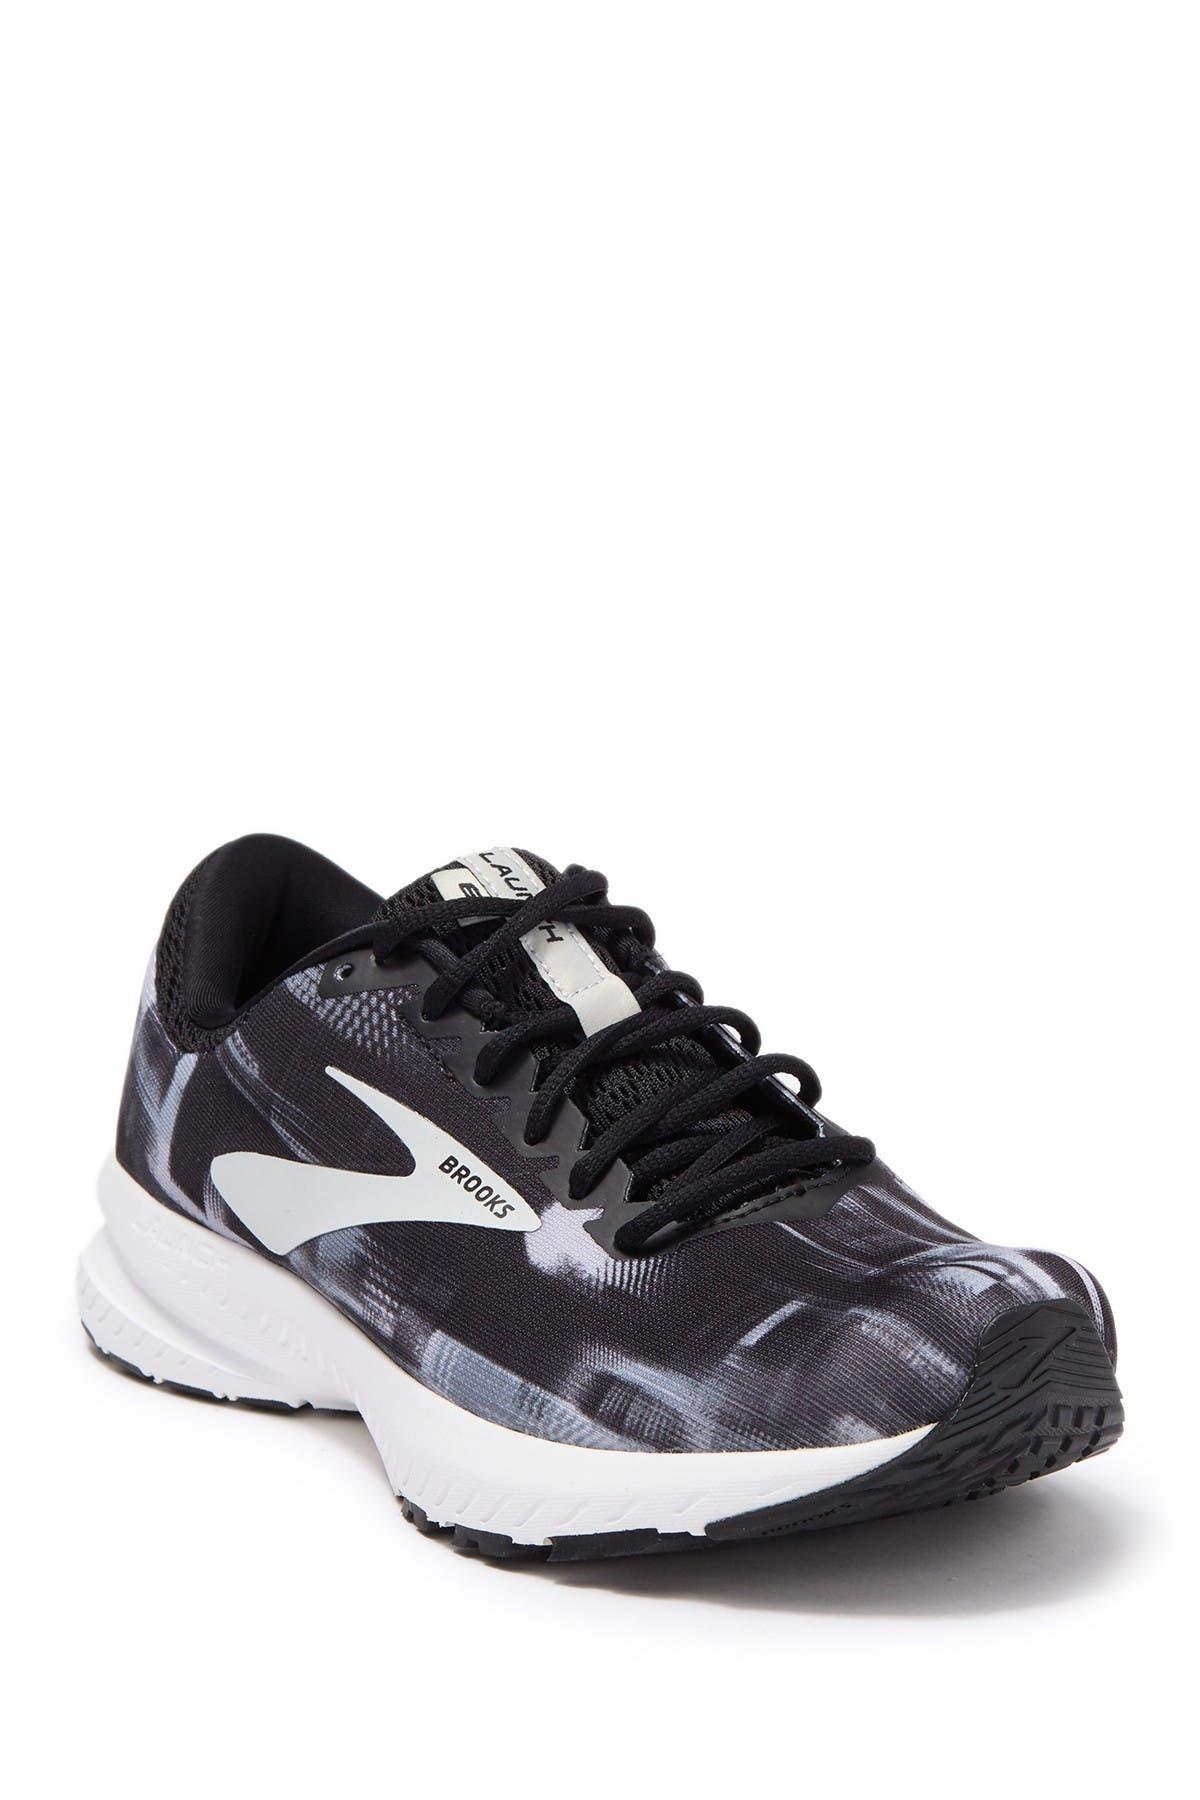 Brooks | Launch 6 Running Shoe - Wide